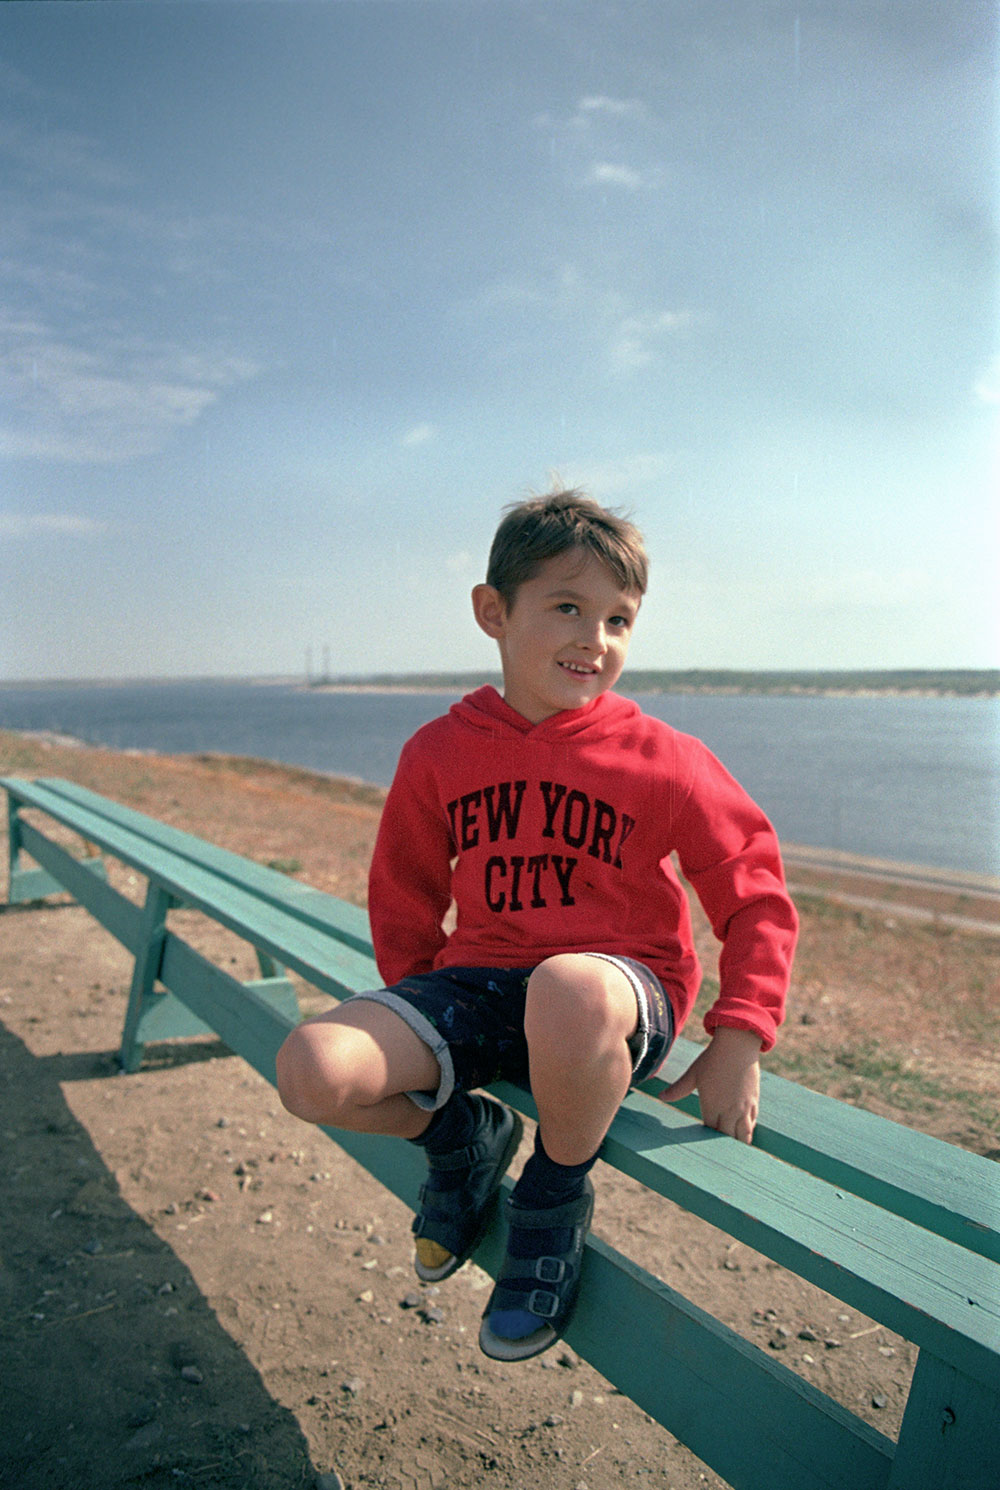 Пример фото на пленку Kodak Pro Image 100 без обработки